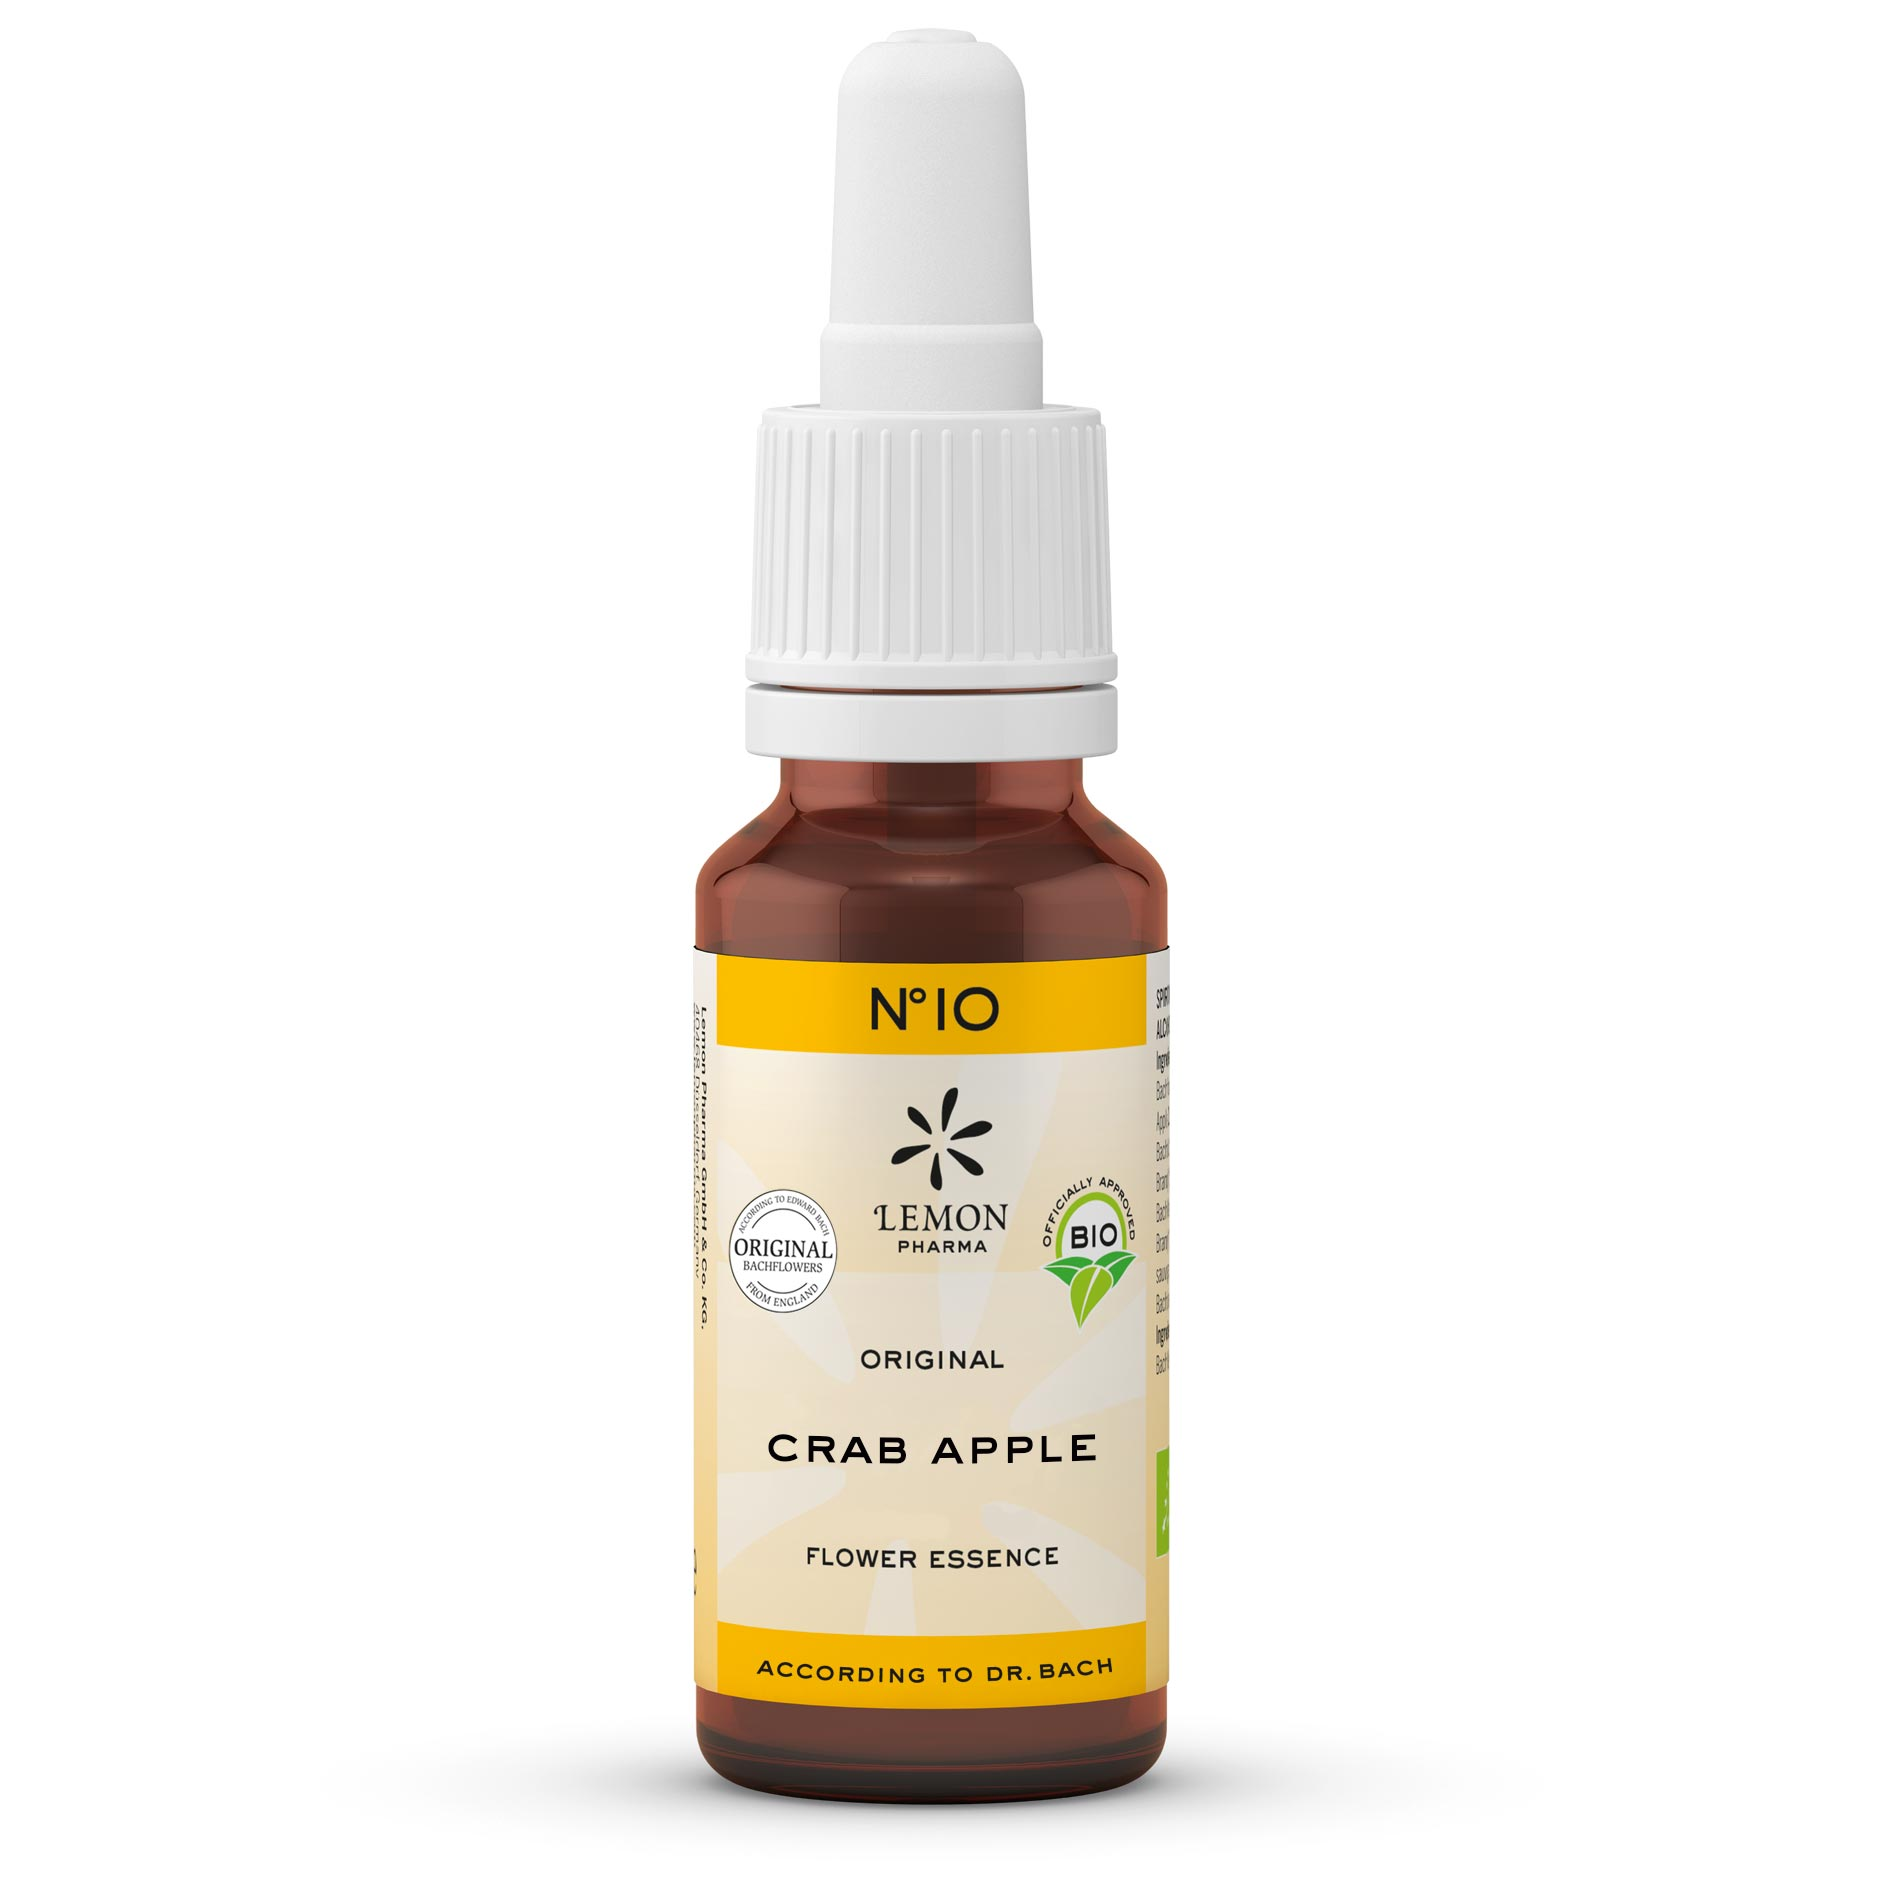 Lemon Pharma Original Bachblüten Tropfen Nr 10 Crab Apple Holzapfel Reinigung